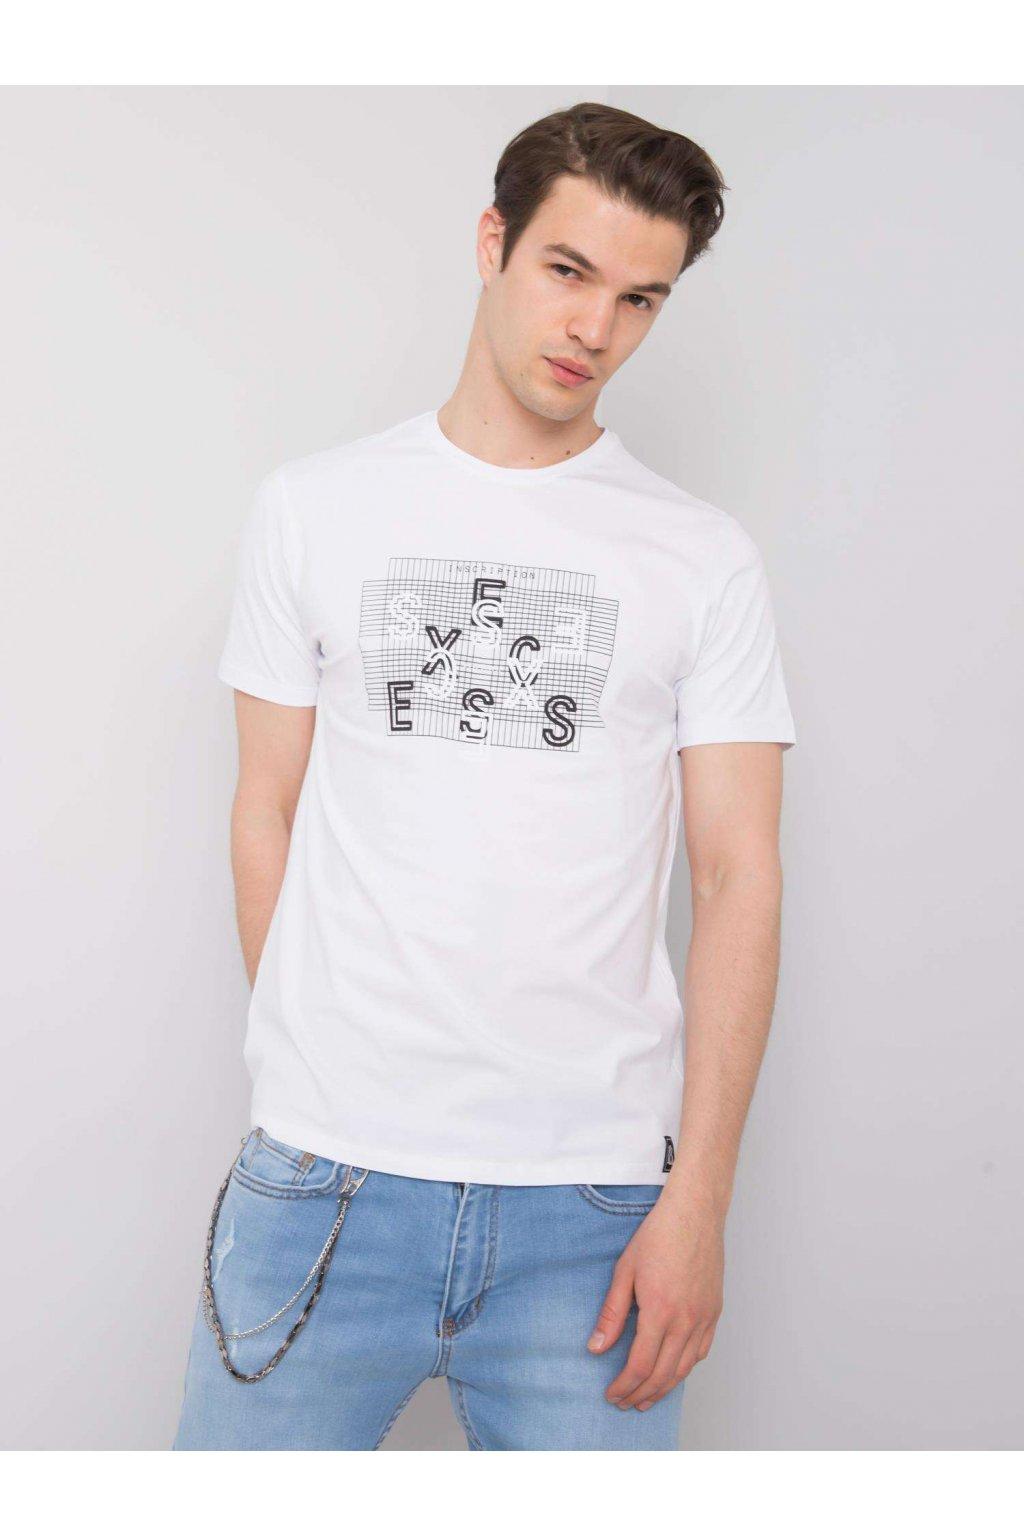 Pánske tričko t-shirt kód TSKK-Y21-0000151